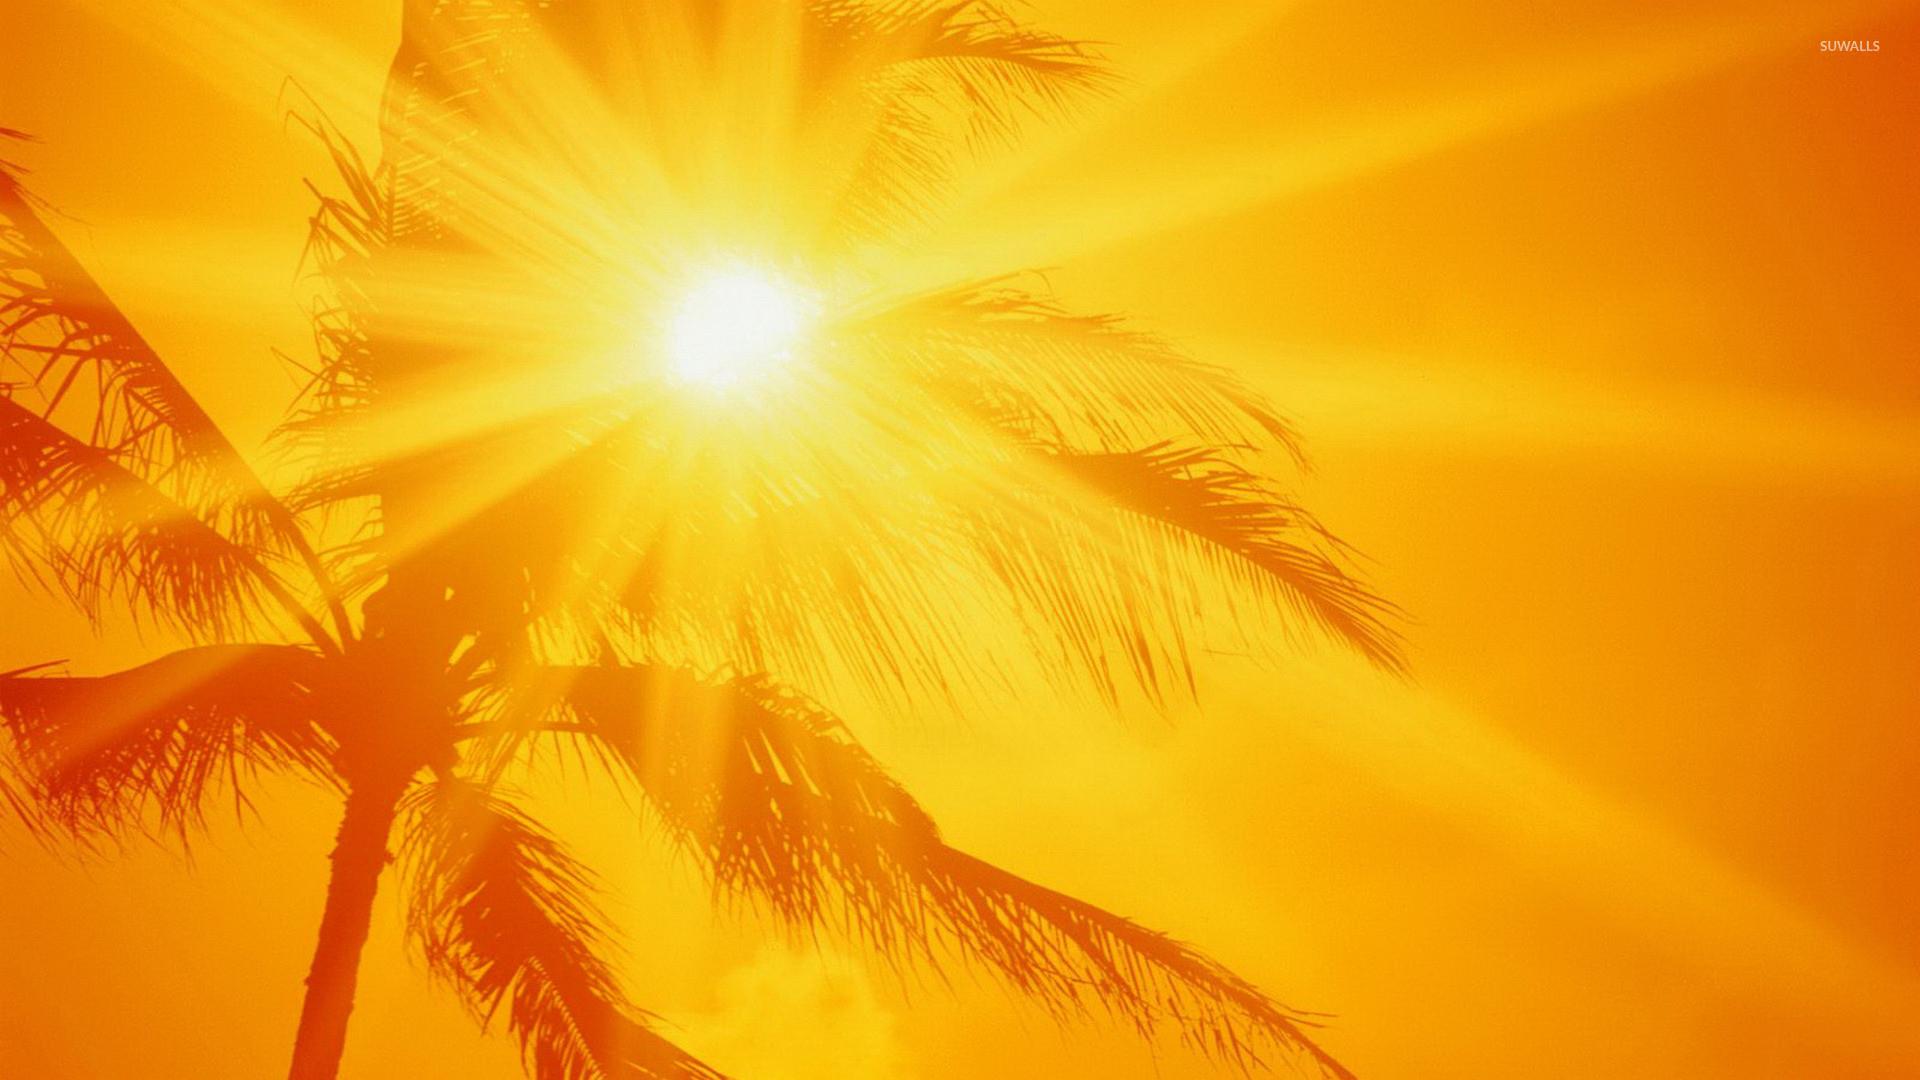 … sunlit palm tree wallpaper artistic wallpapers 20566 …